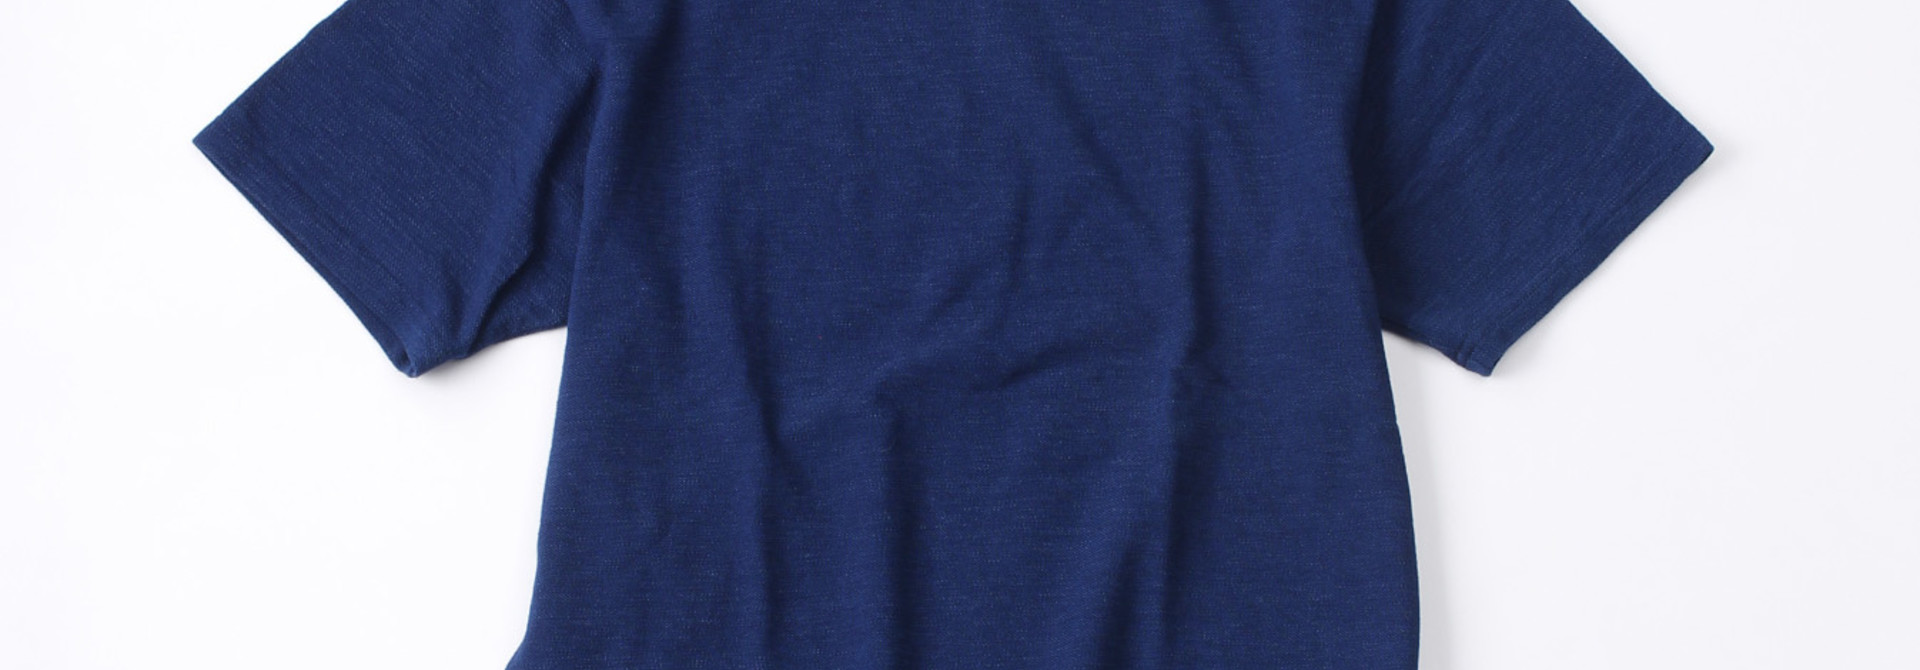 WH Indigo Ultimate Pique T-shirt Distressed